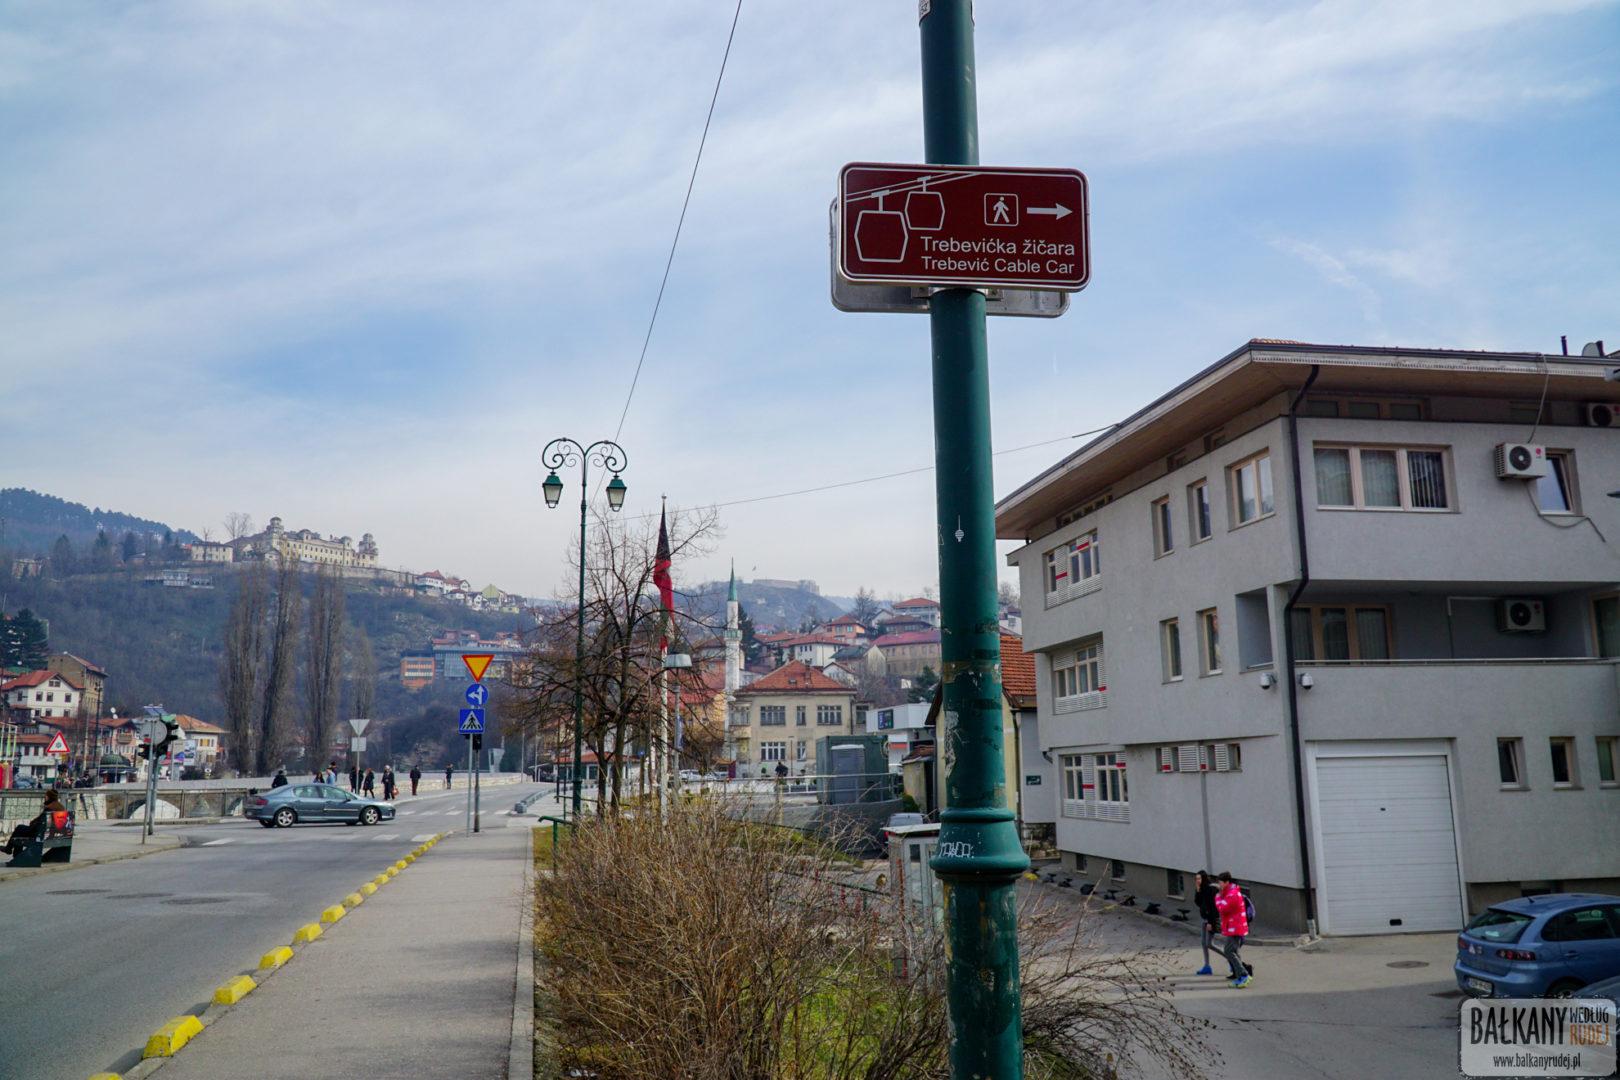 kolej linowa na Trebevic